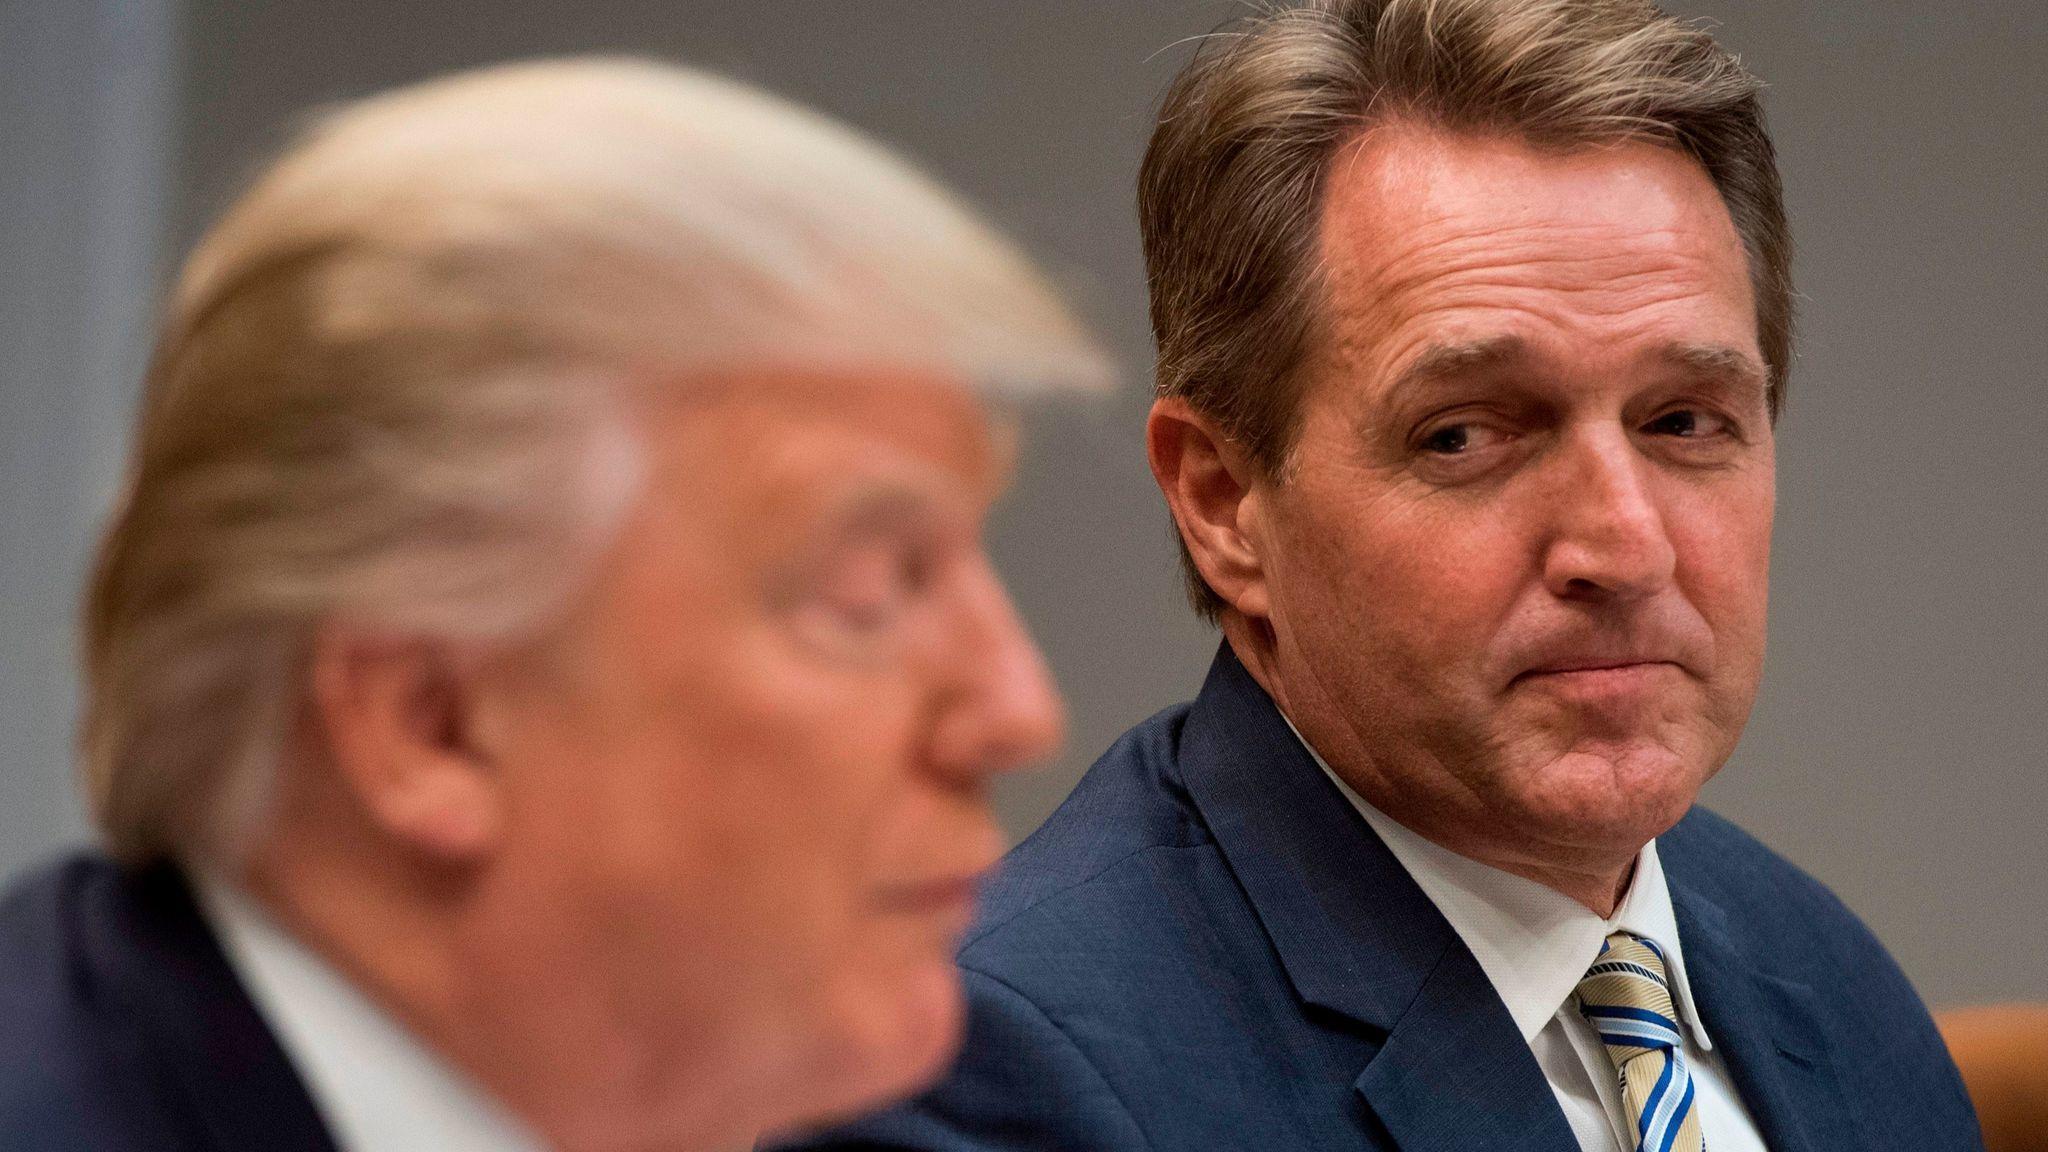 President Trump and Sen. Jeff Flake